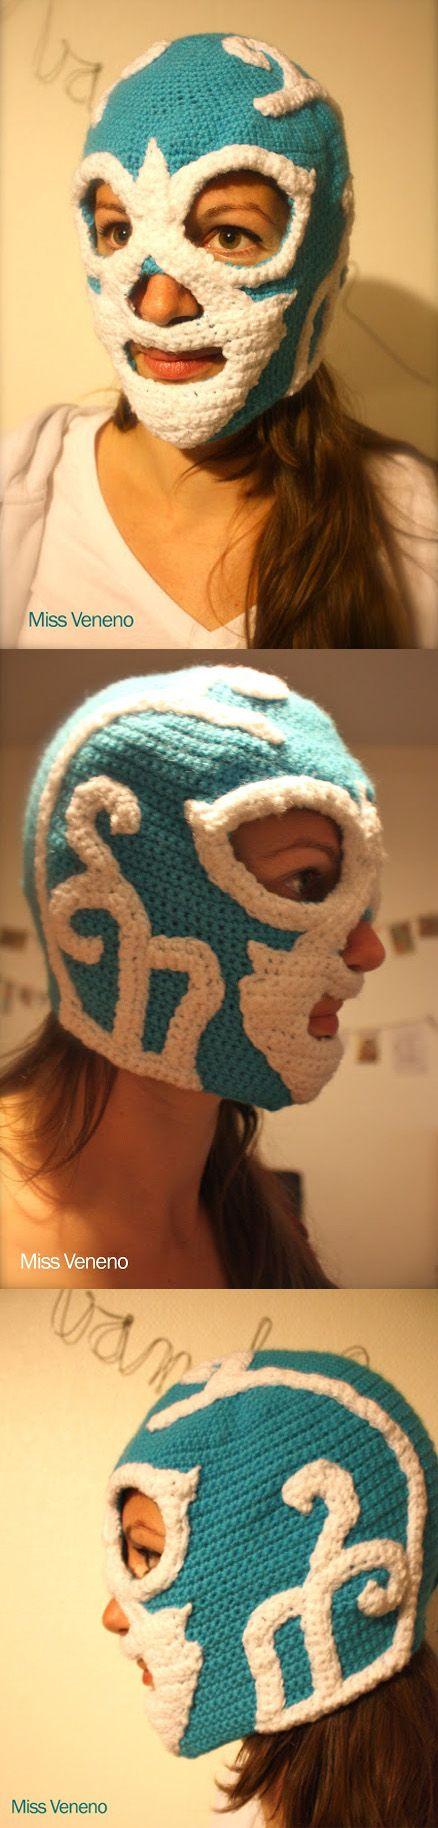 Miss Veneno - Huracan Ramirez -crochet masque lucha libre